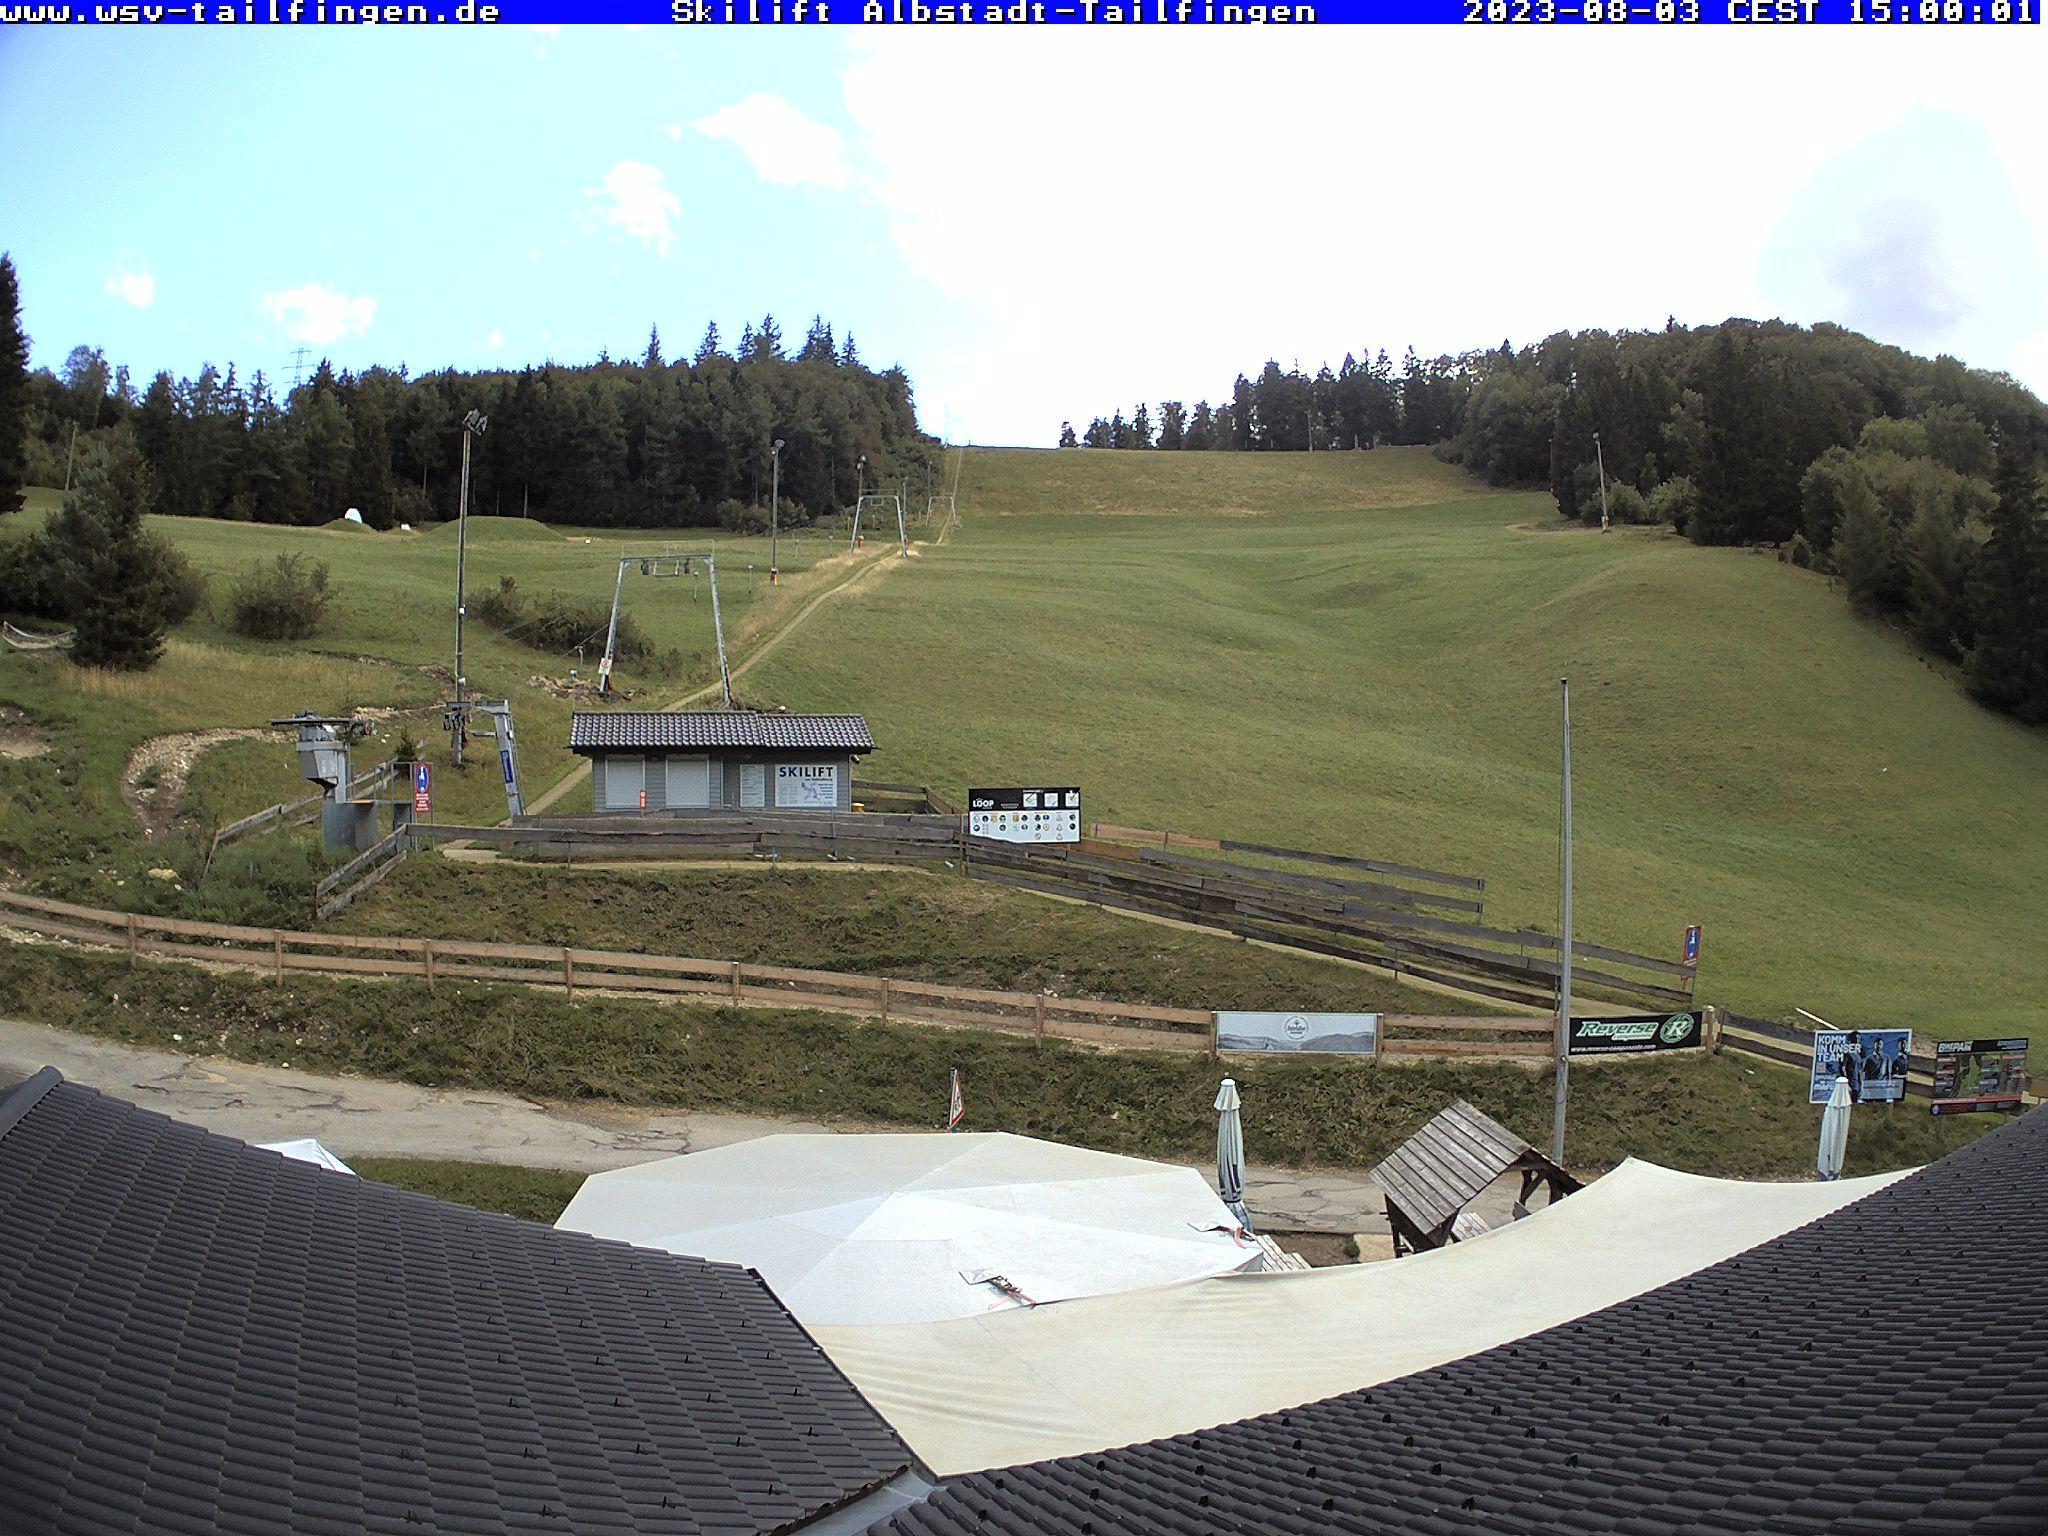 Webcam-Foto 15:00 Uhr / Skilift Albstadt-Tailfingen